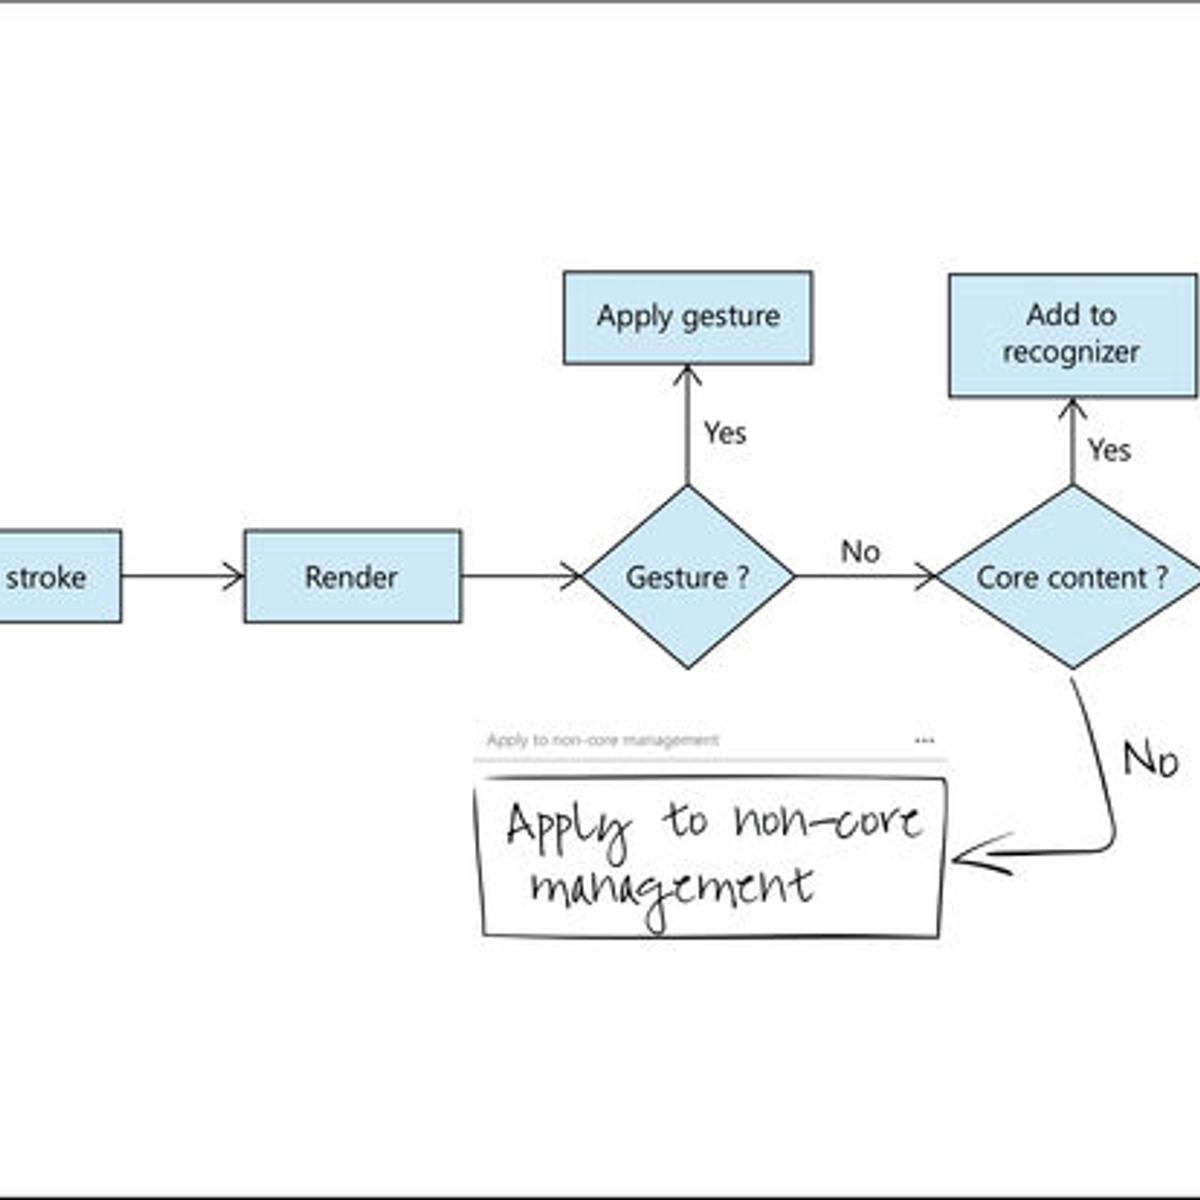 Mark Flowcharts Diagrams Alternatives And Similar Apps